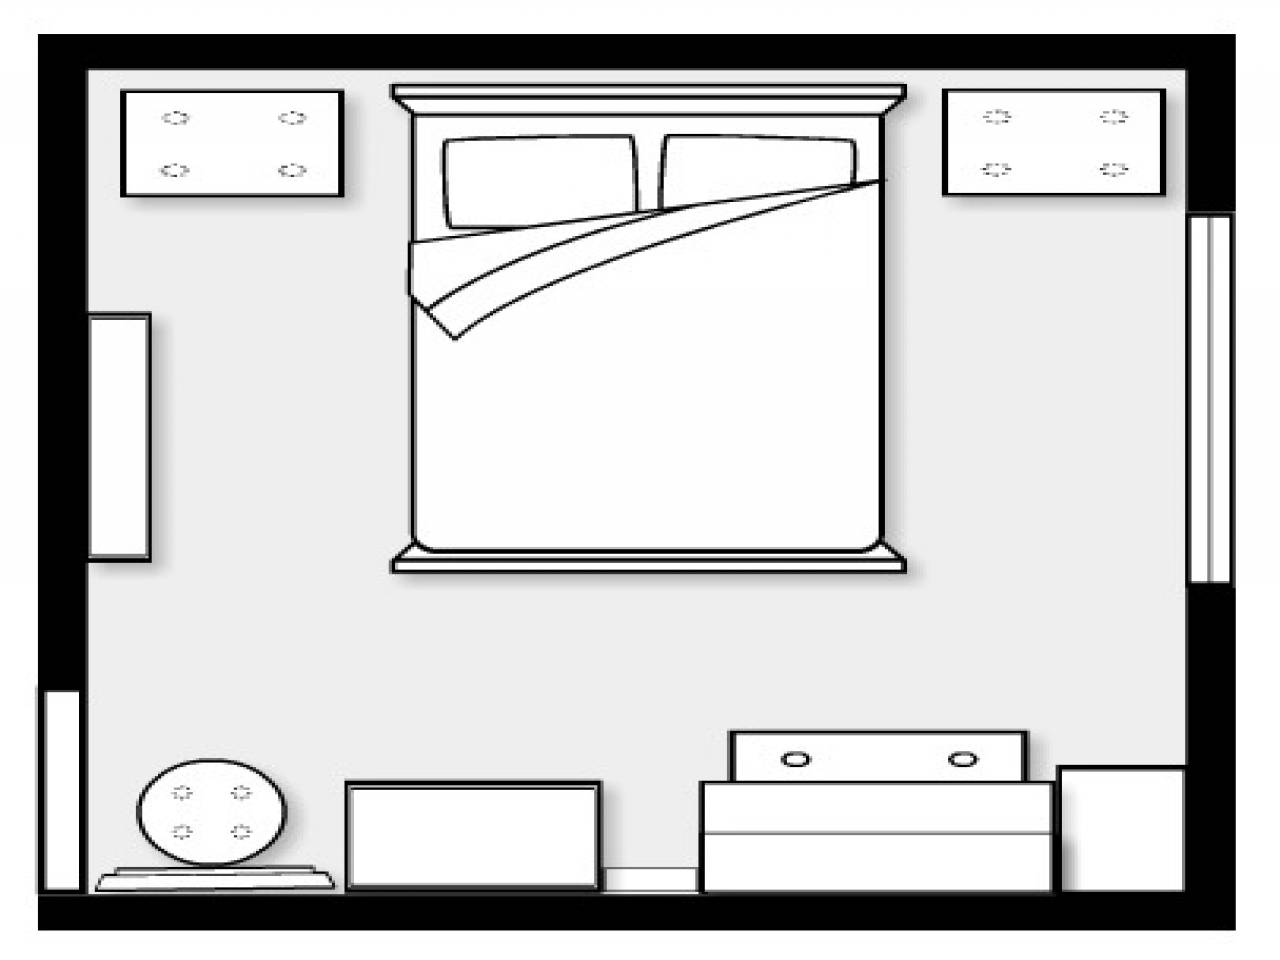 Bedroom Layout Planner Room Design